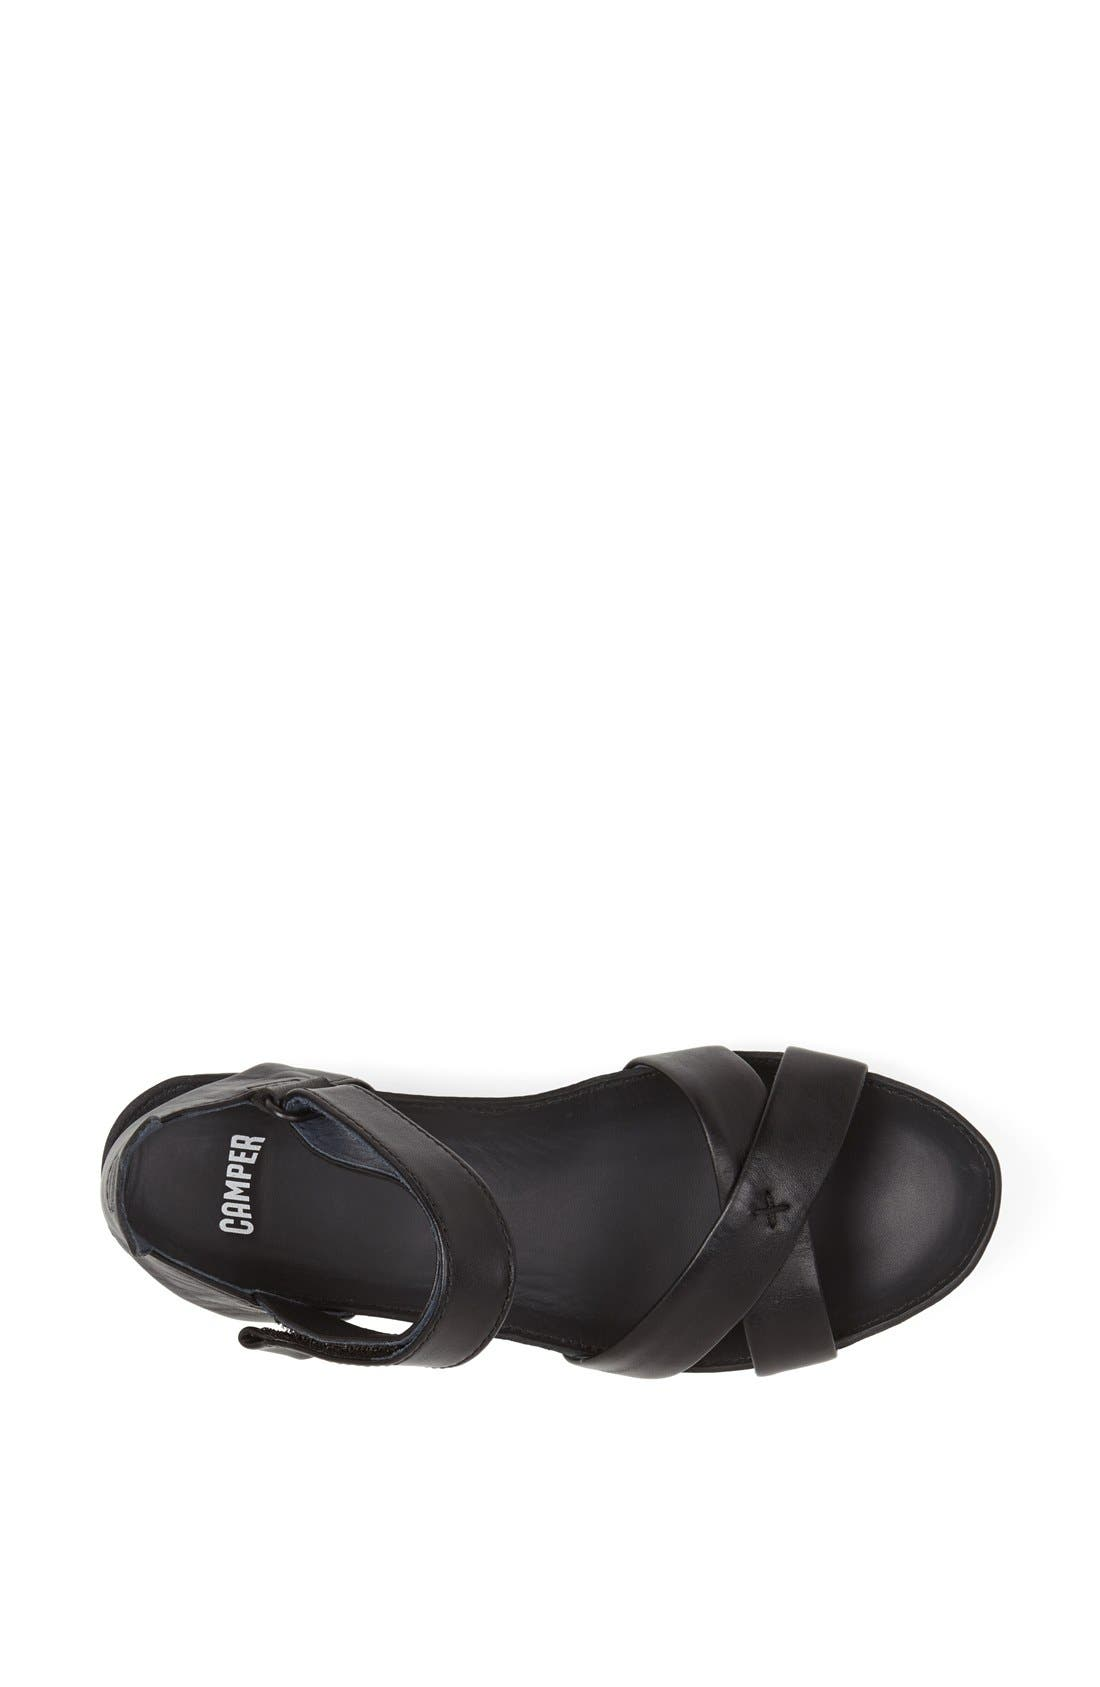 'Micro' Sandal,                             Alternate thumbnail 3, color,                             001